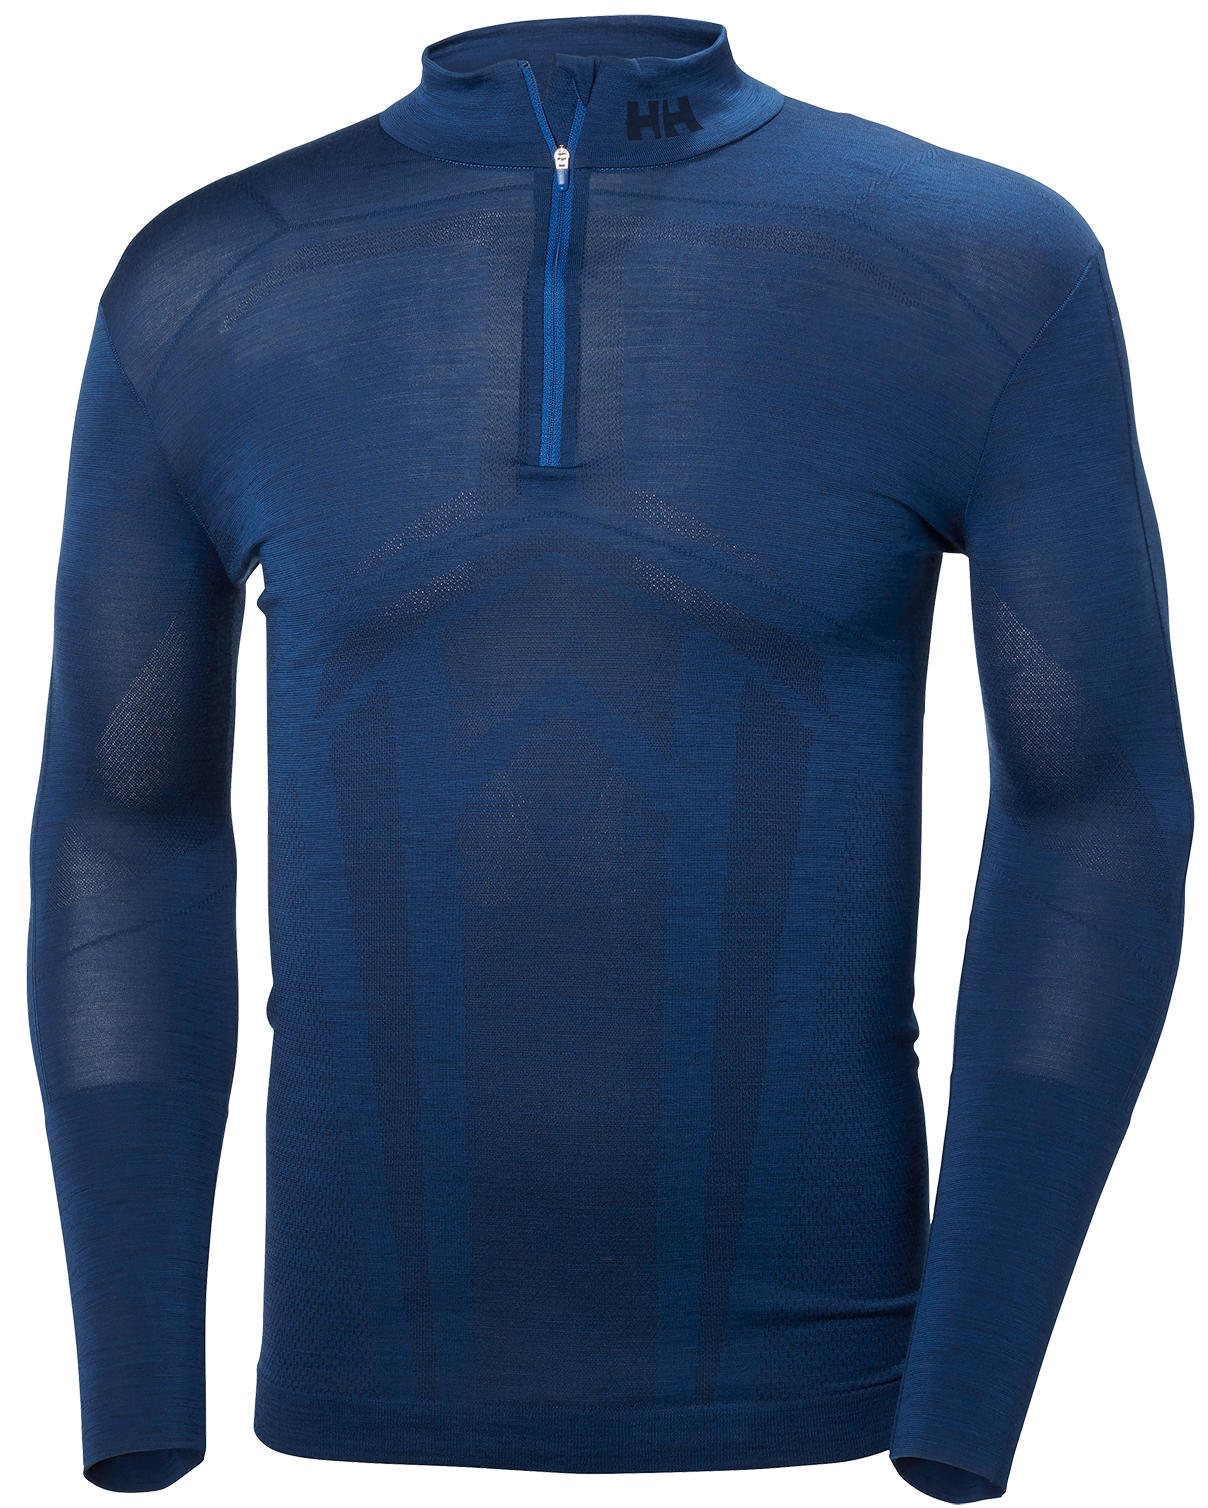 Review of Helly Hansen baselayers best ski thermals HH Lifa Merino Seamless half zip top